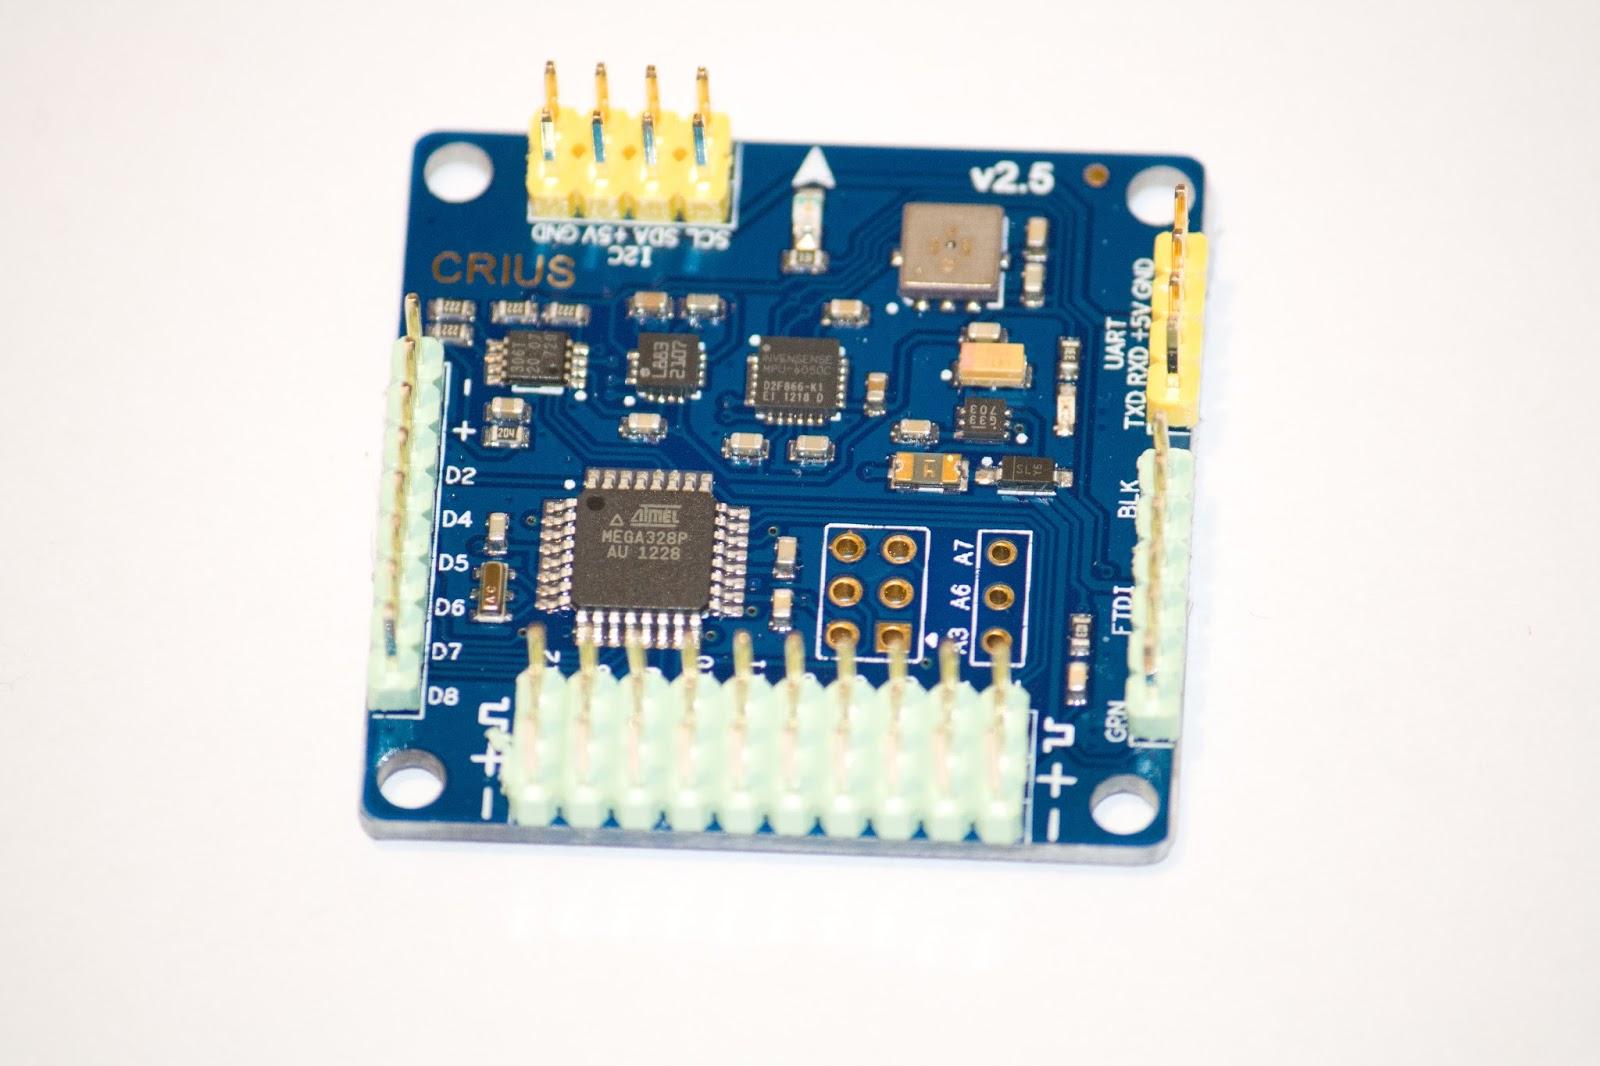 ATMega 328P Microcontroller • MPU6050C 6 axis gyro/accel with Motion  Processing Unit • HMC5883L 3-axis digital magnetometer • BMP085 digital  pressure sensor